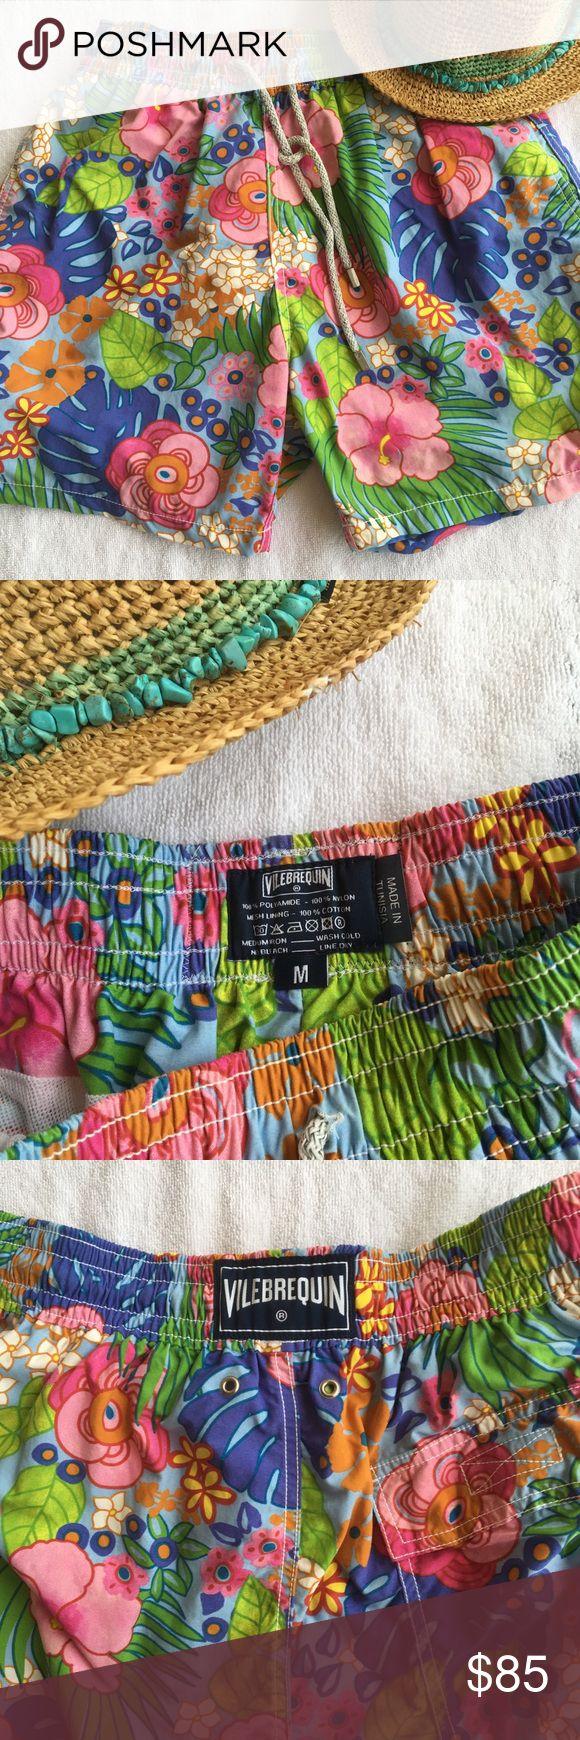 Fabulous Fantasy Floral VILEBREQUIN Men's Swimsuit Super beautiful colors!  Always handwahed. Vilebrequin Swim Swim Trunks